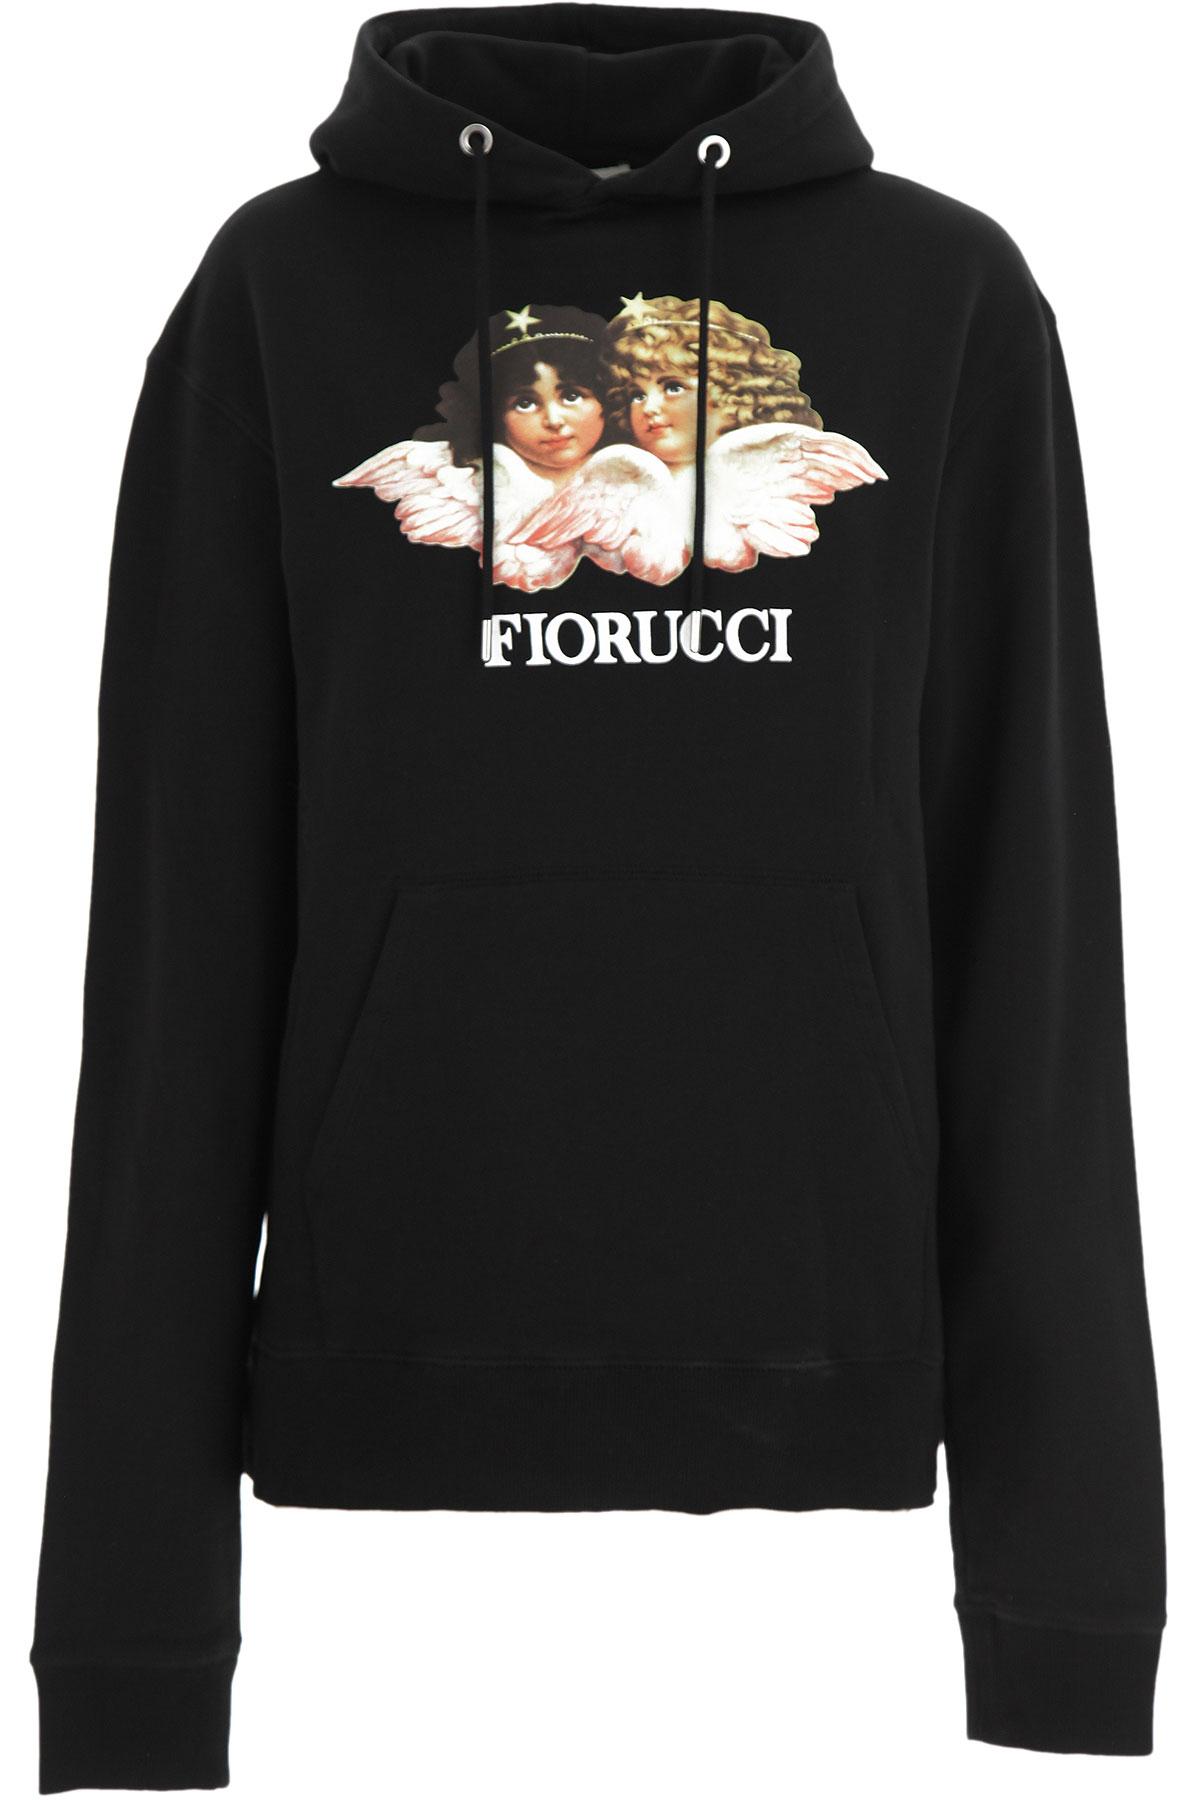 Fiorucci Sweatshirt for Women On Sale, Black, Cotton, 2019, 2 4 6 8